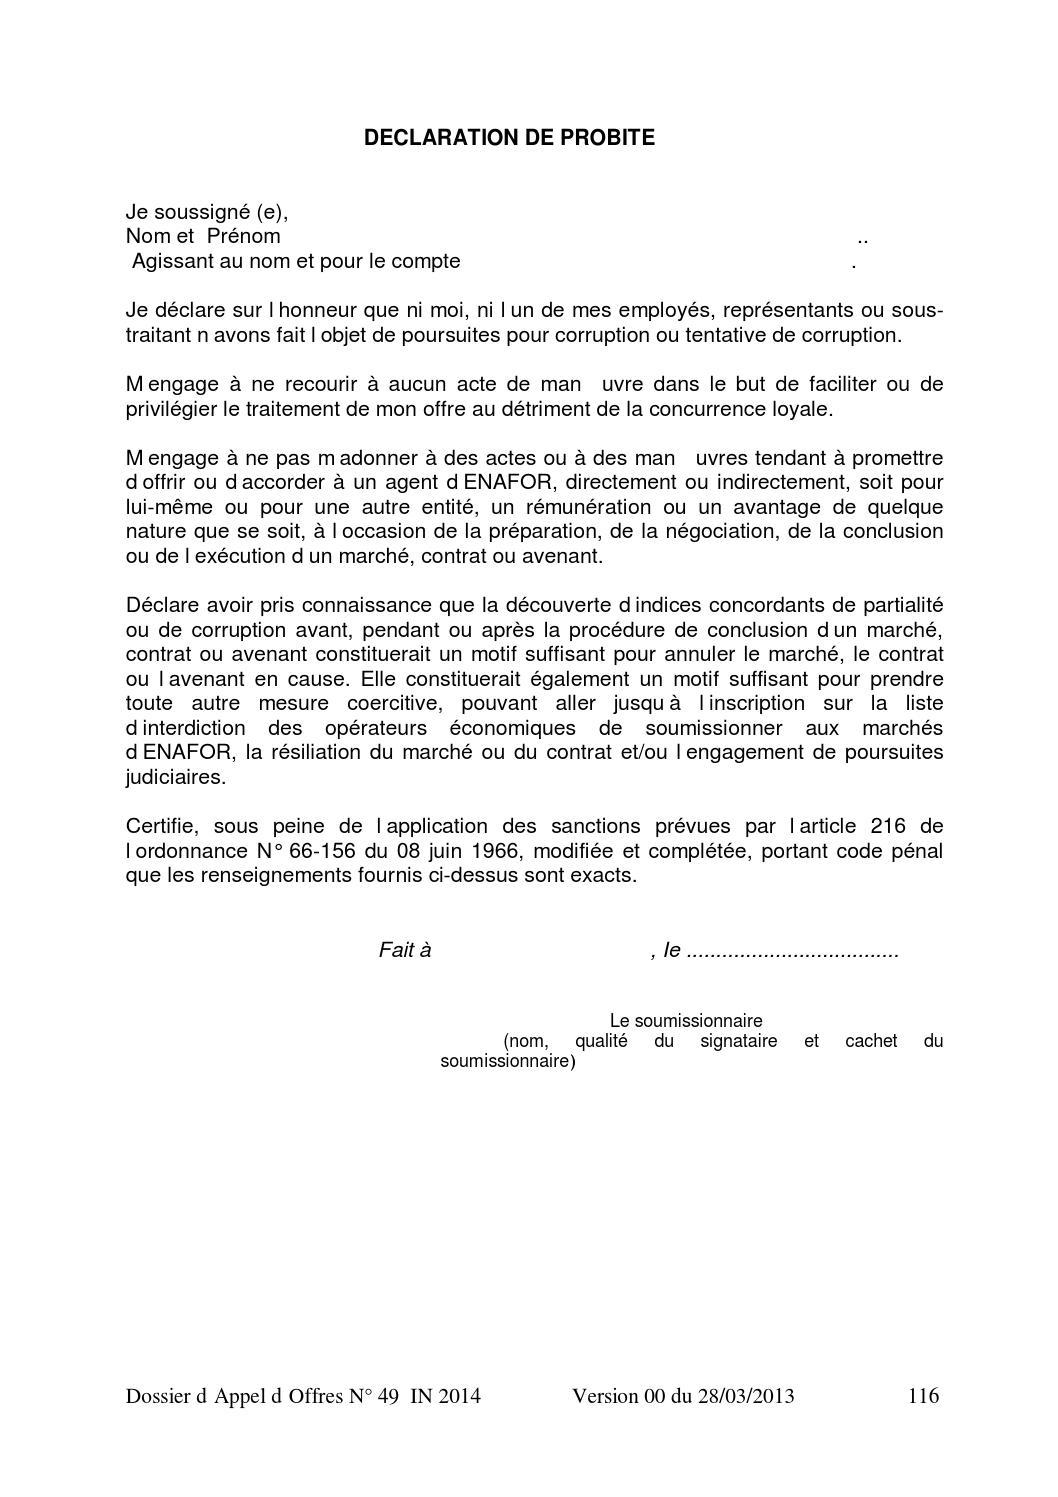 Cahier Des Charges Enafor Hmd By Elmounakassa Issuu